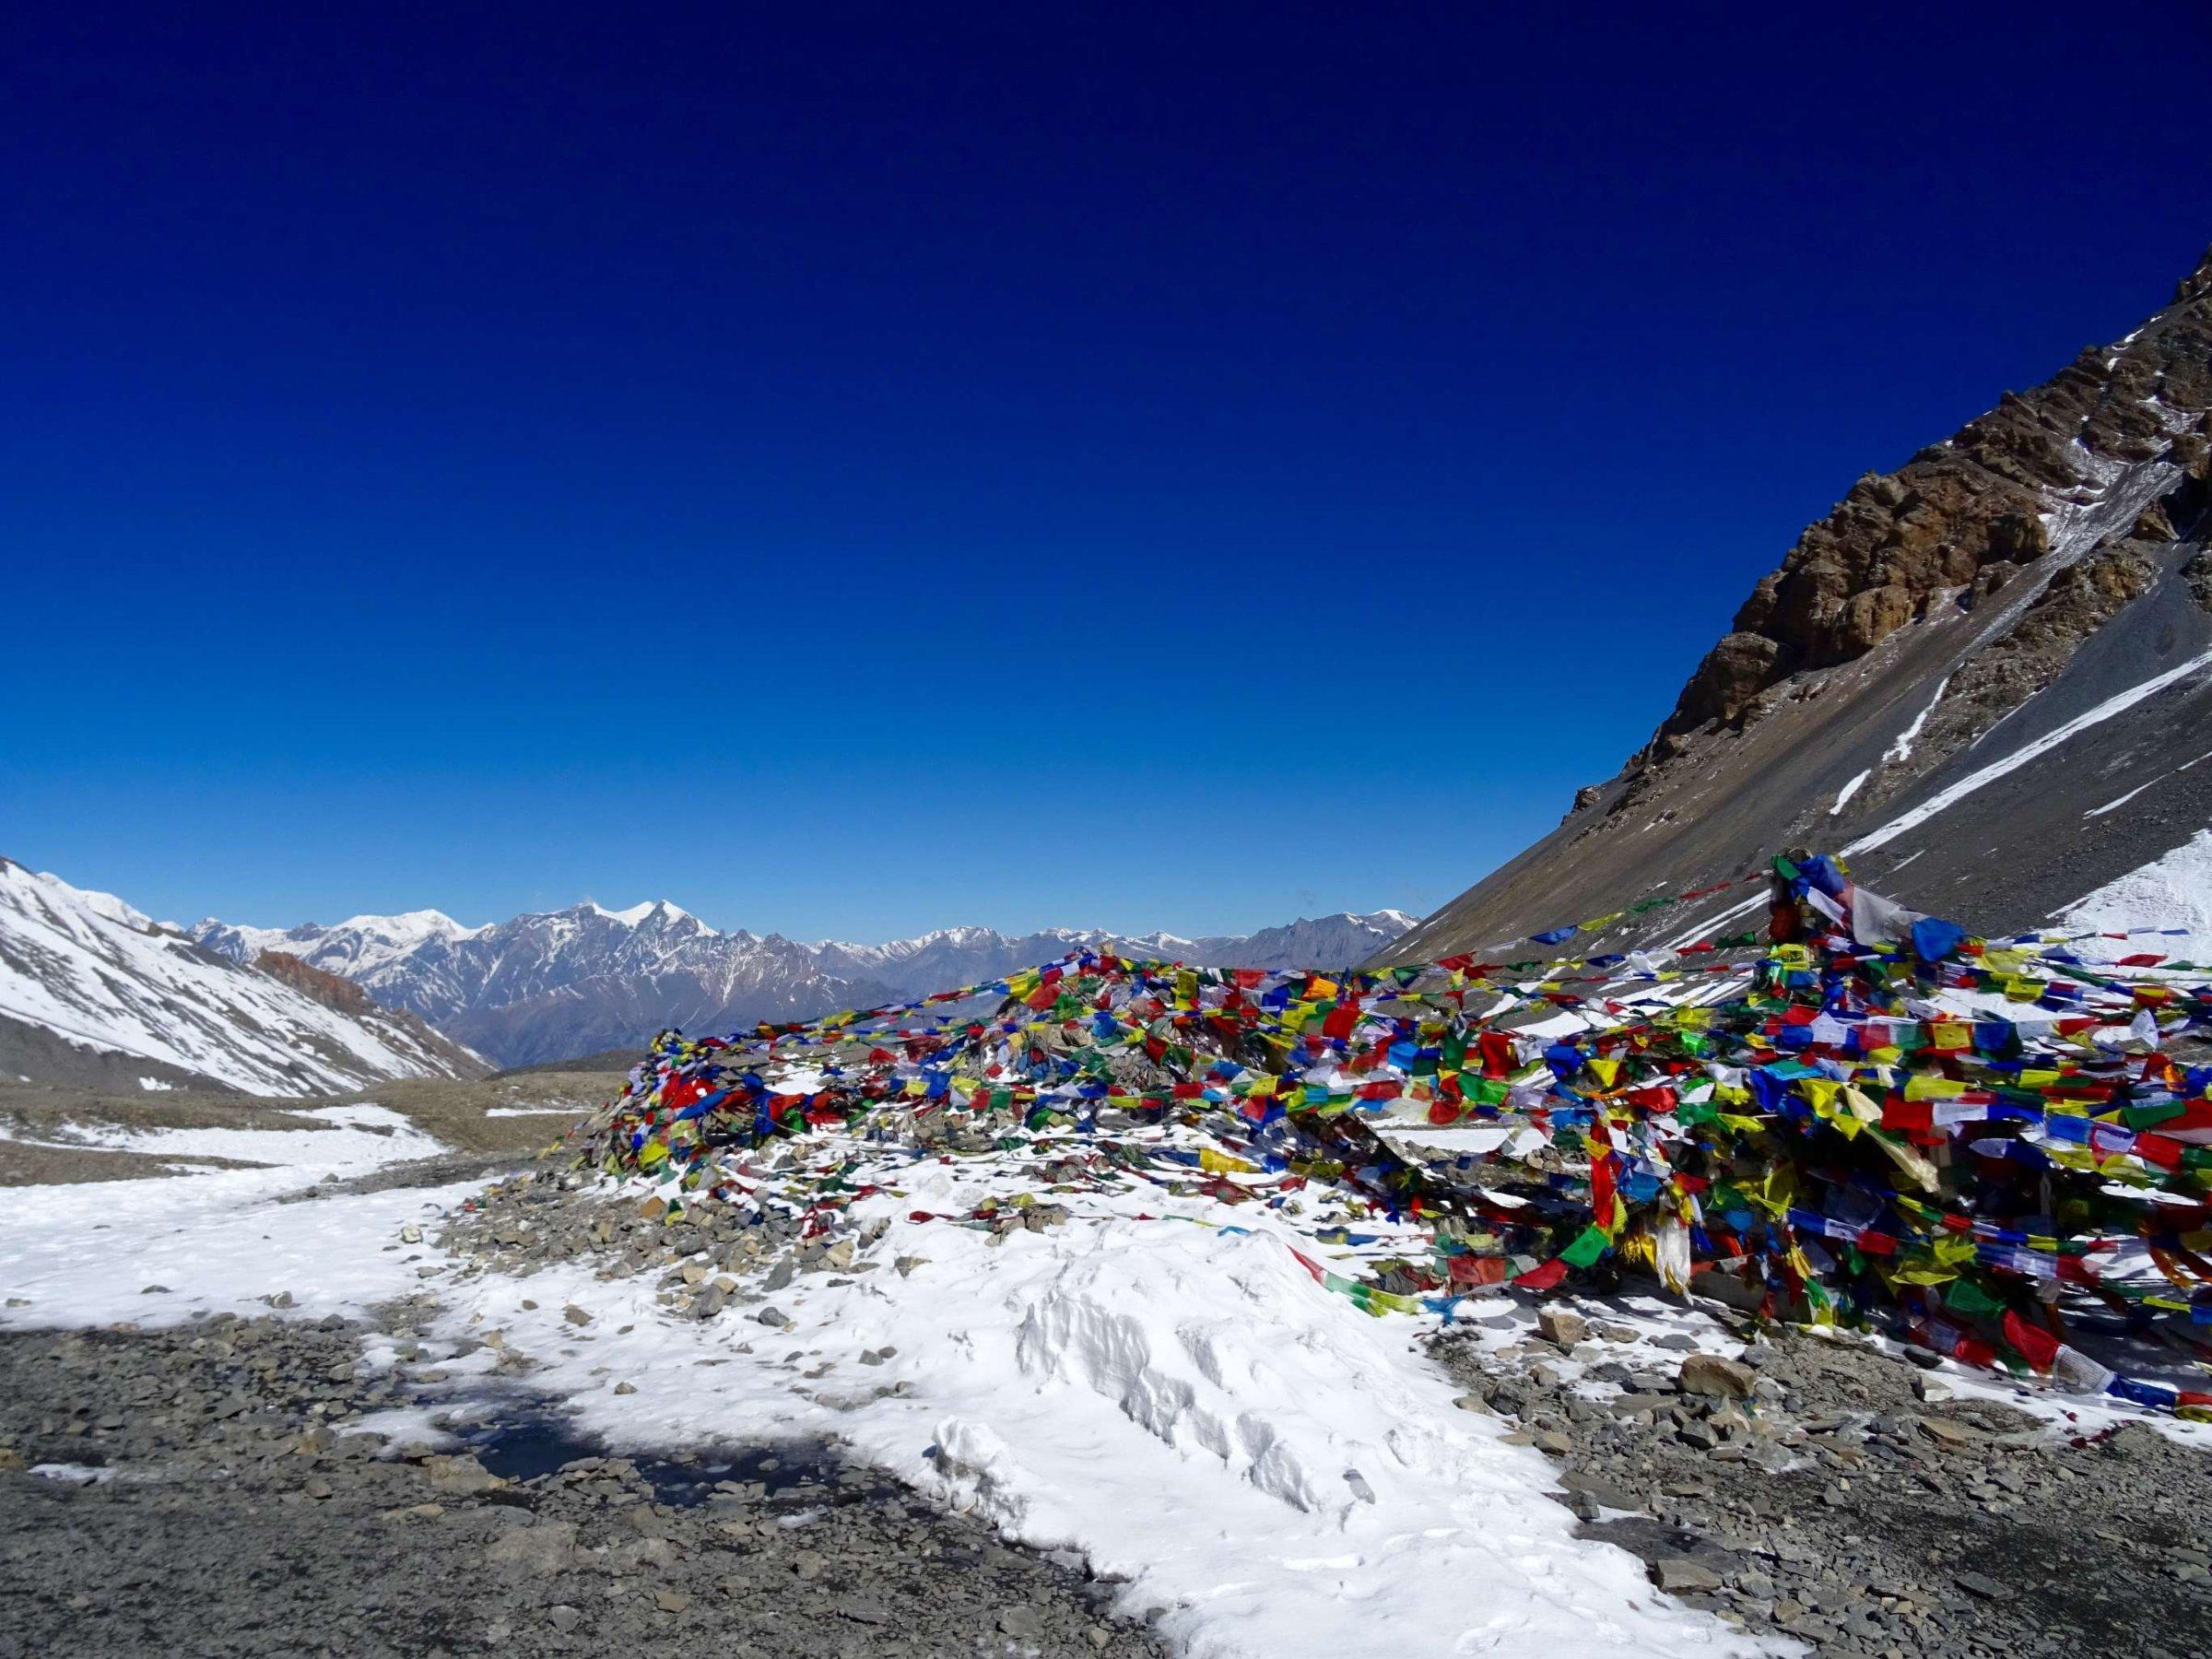 18-Day Incredible Annapurna Circuit Trek - Nepal Itinerary